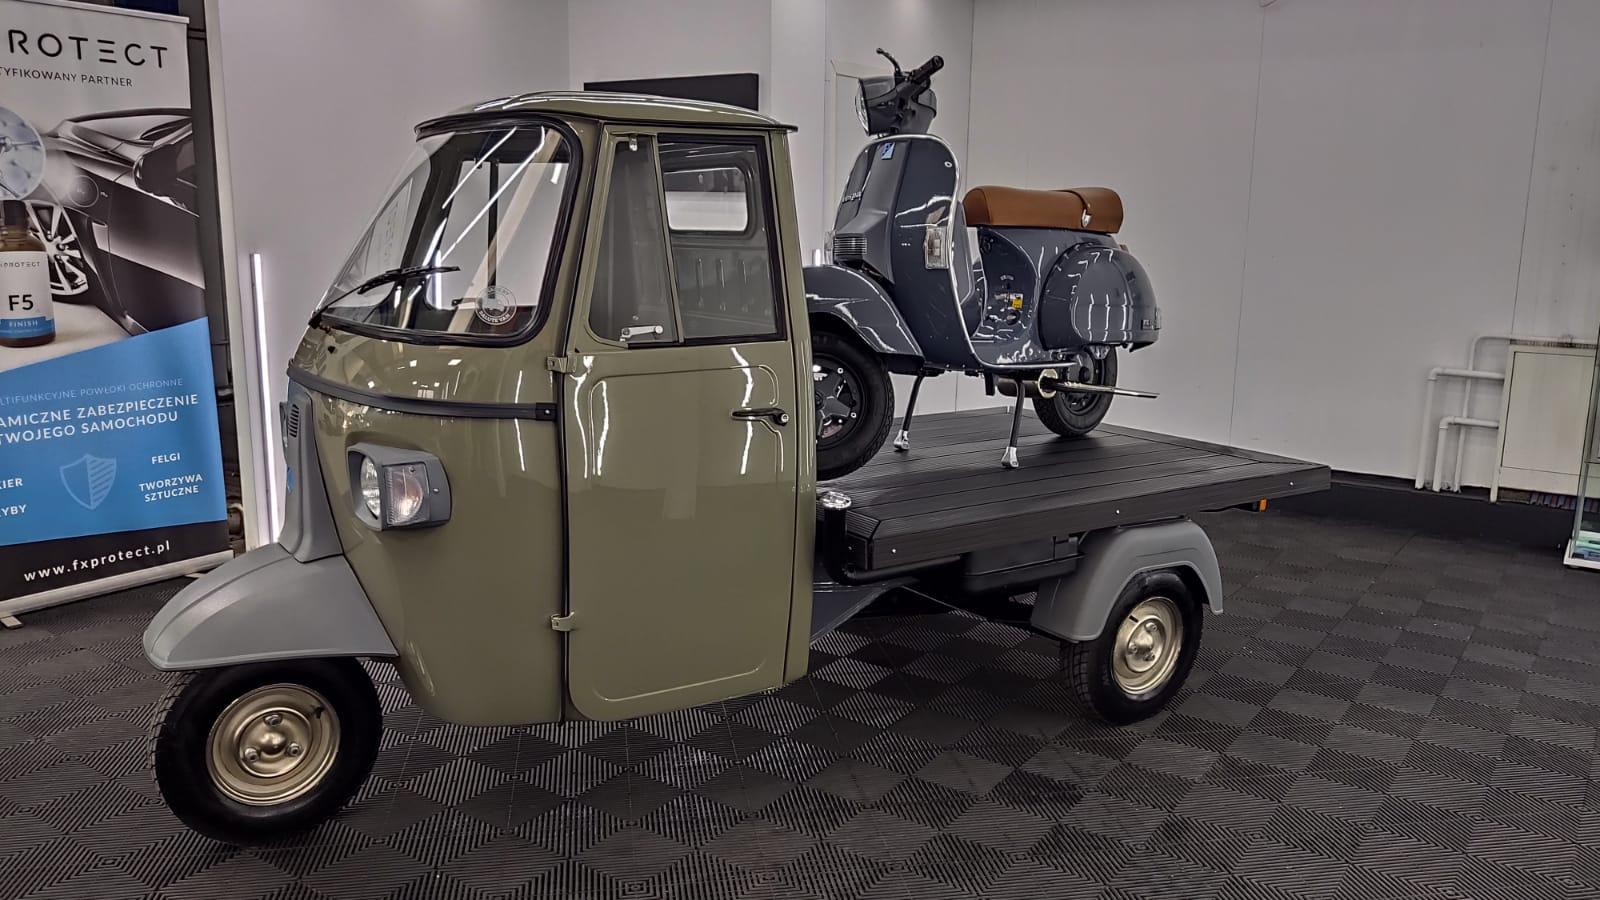 Piaggio Ape 600 MP renowacja